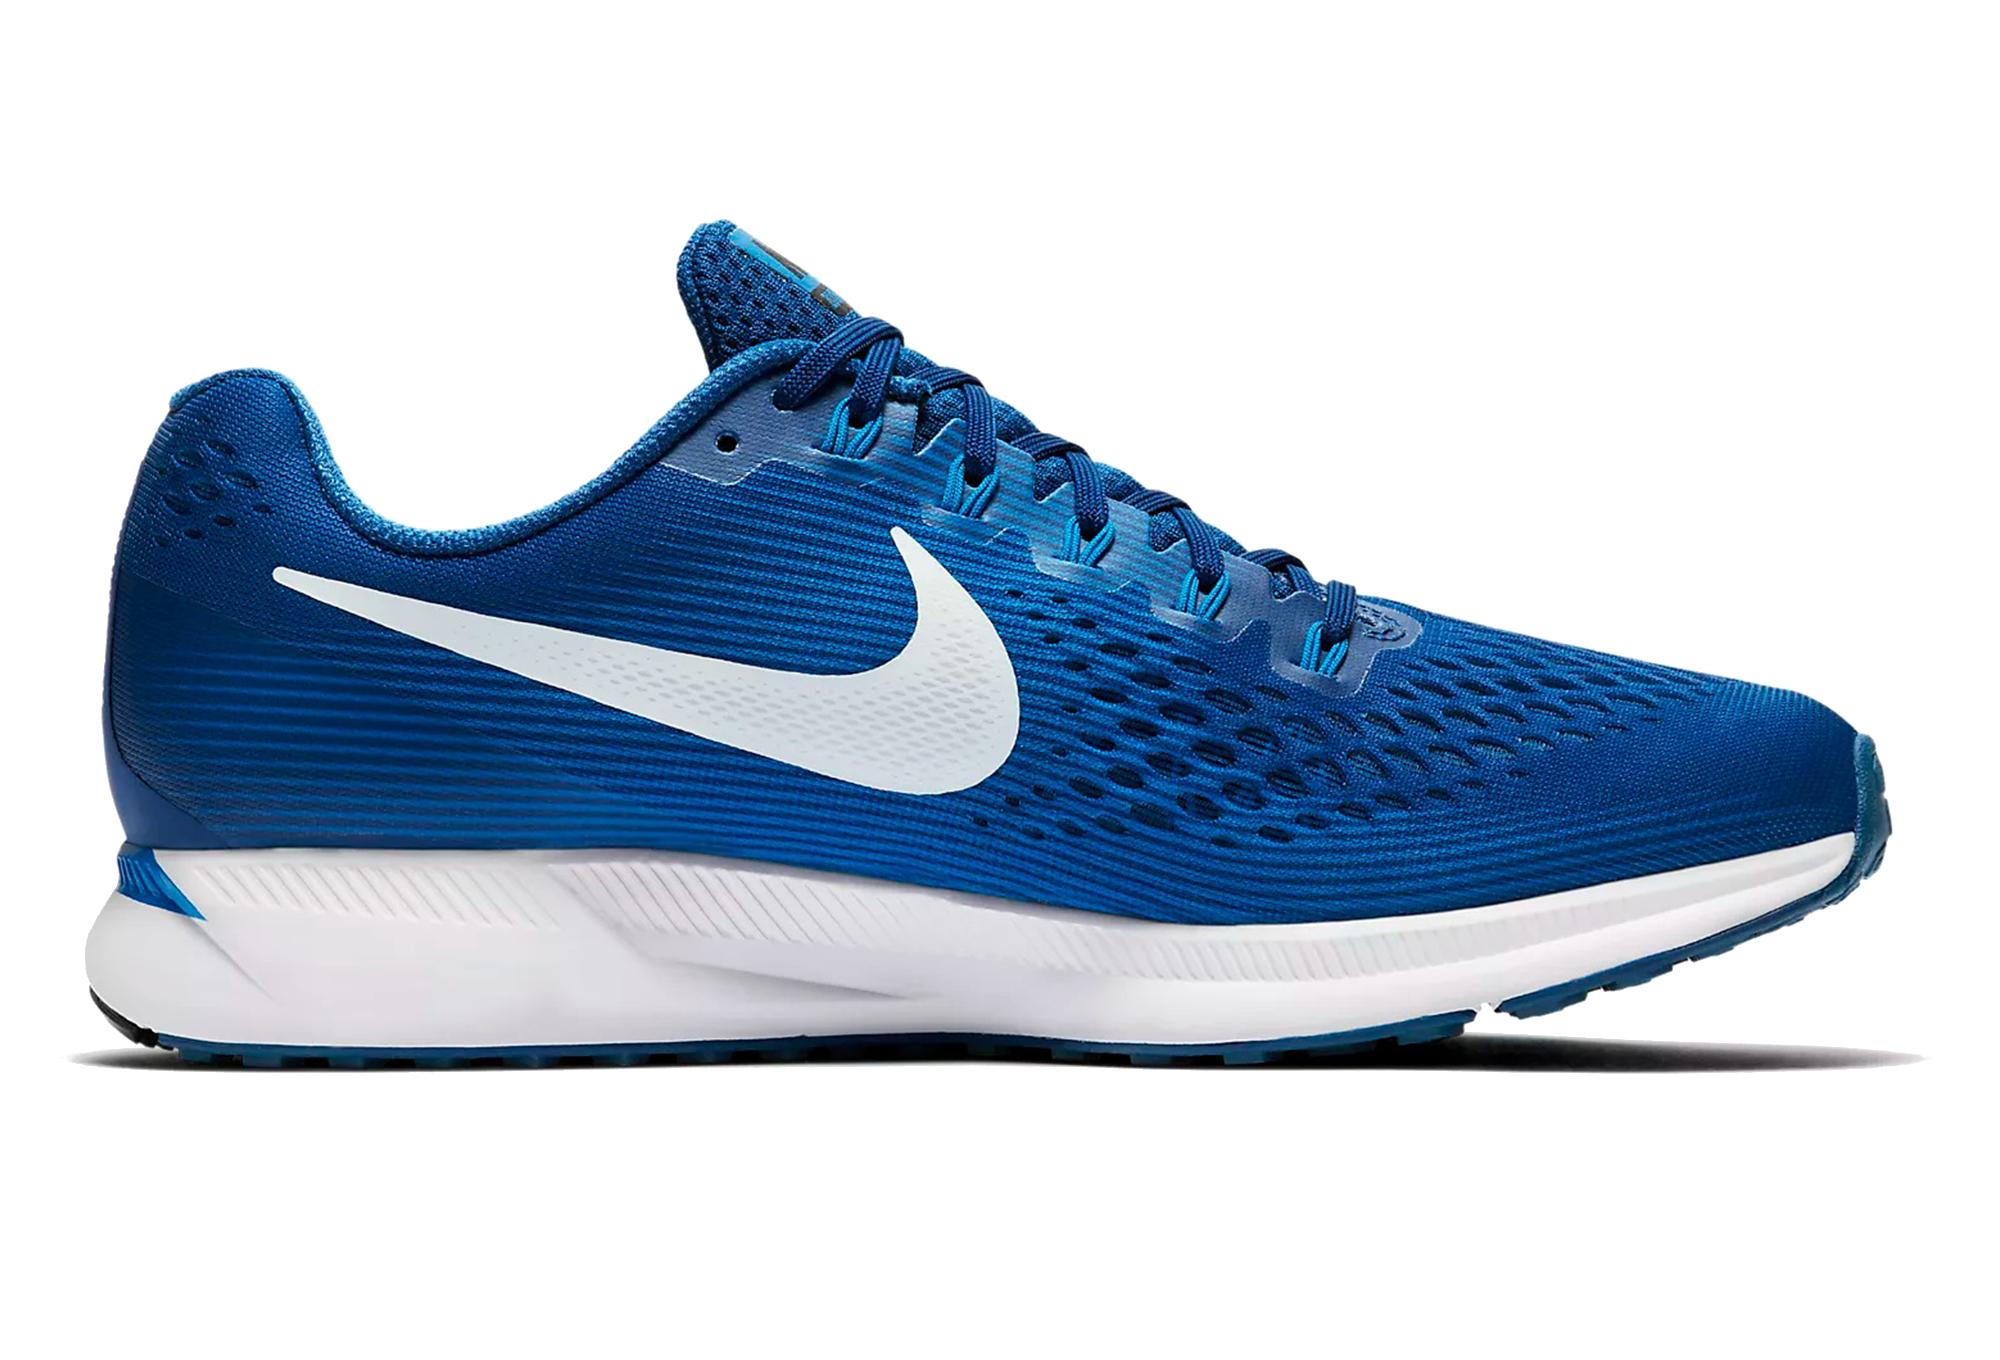 Nike Bmx Race Shoes